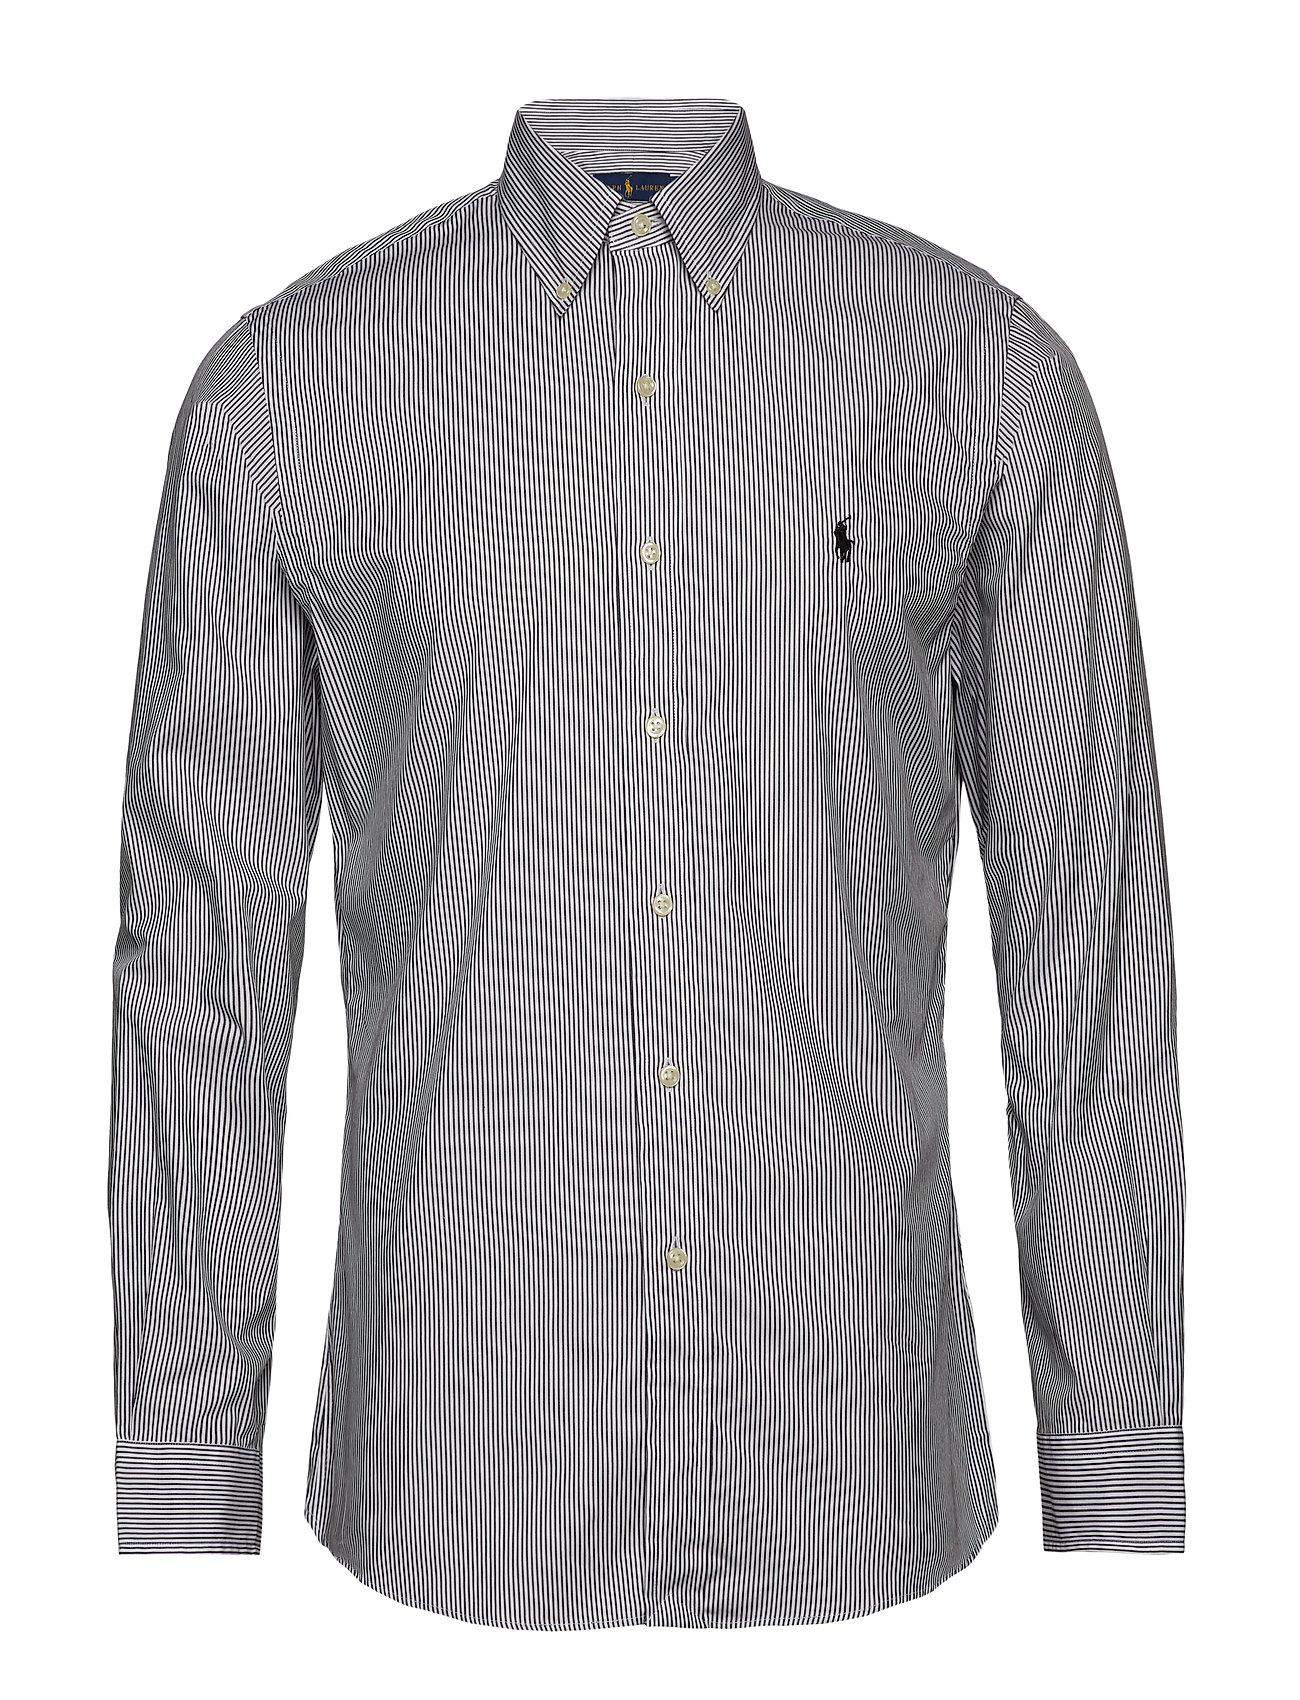 Polo Ralph Lauren Slim Fit Stretch Cotton Shirt - BLACK/WHITE HAIRL